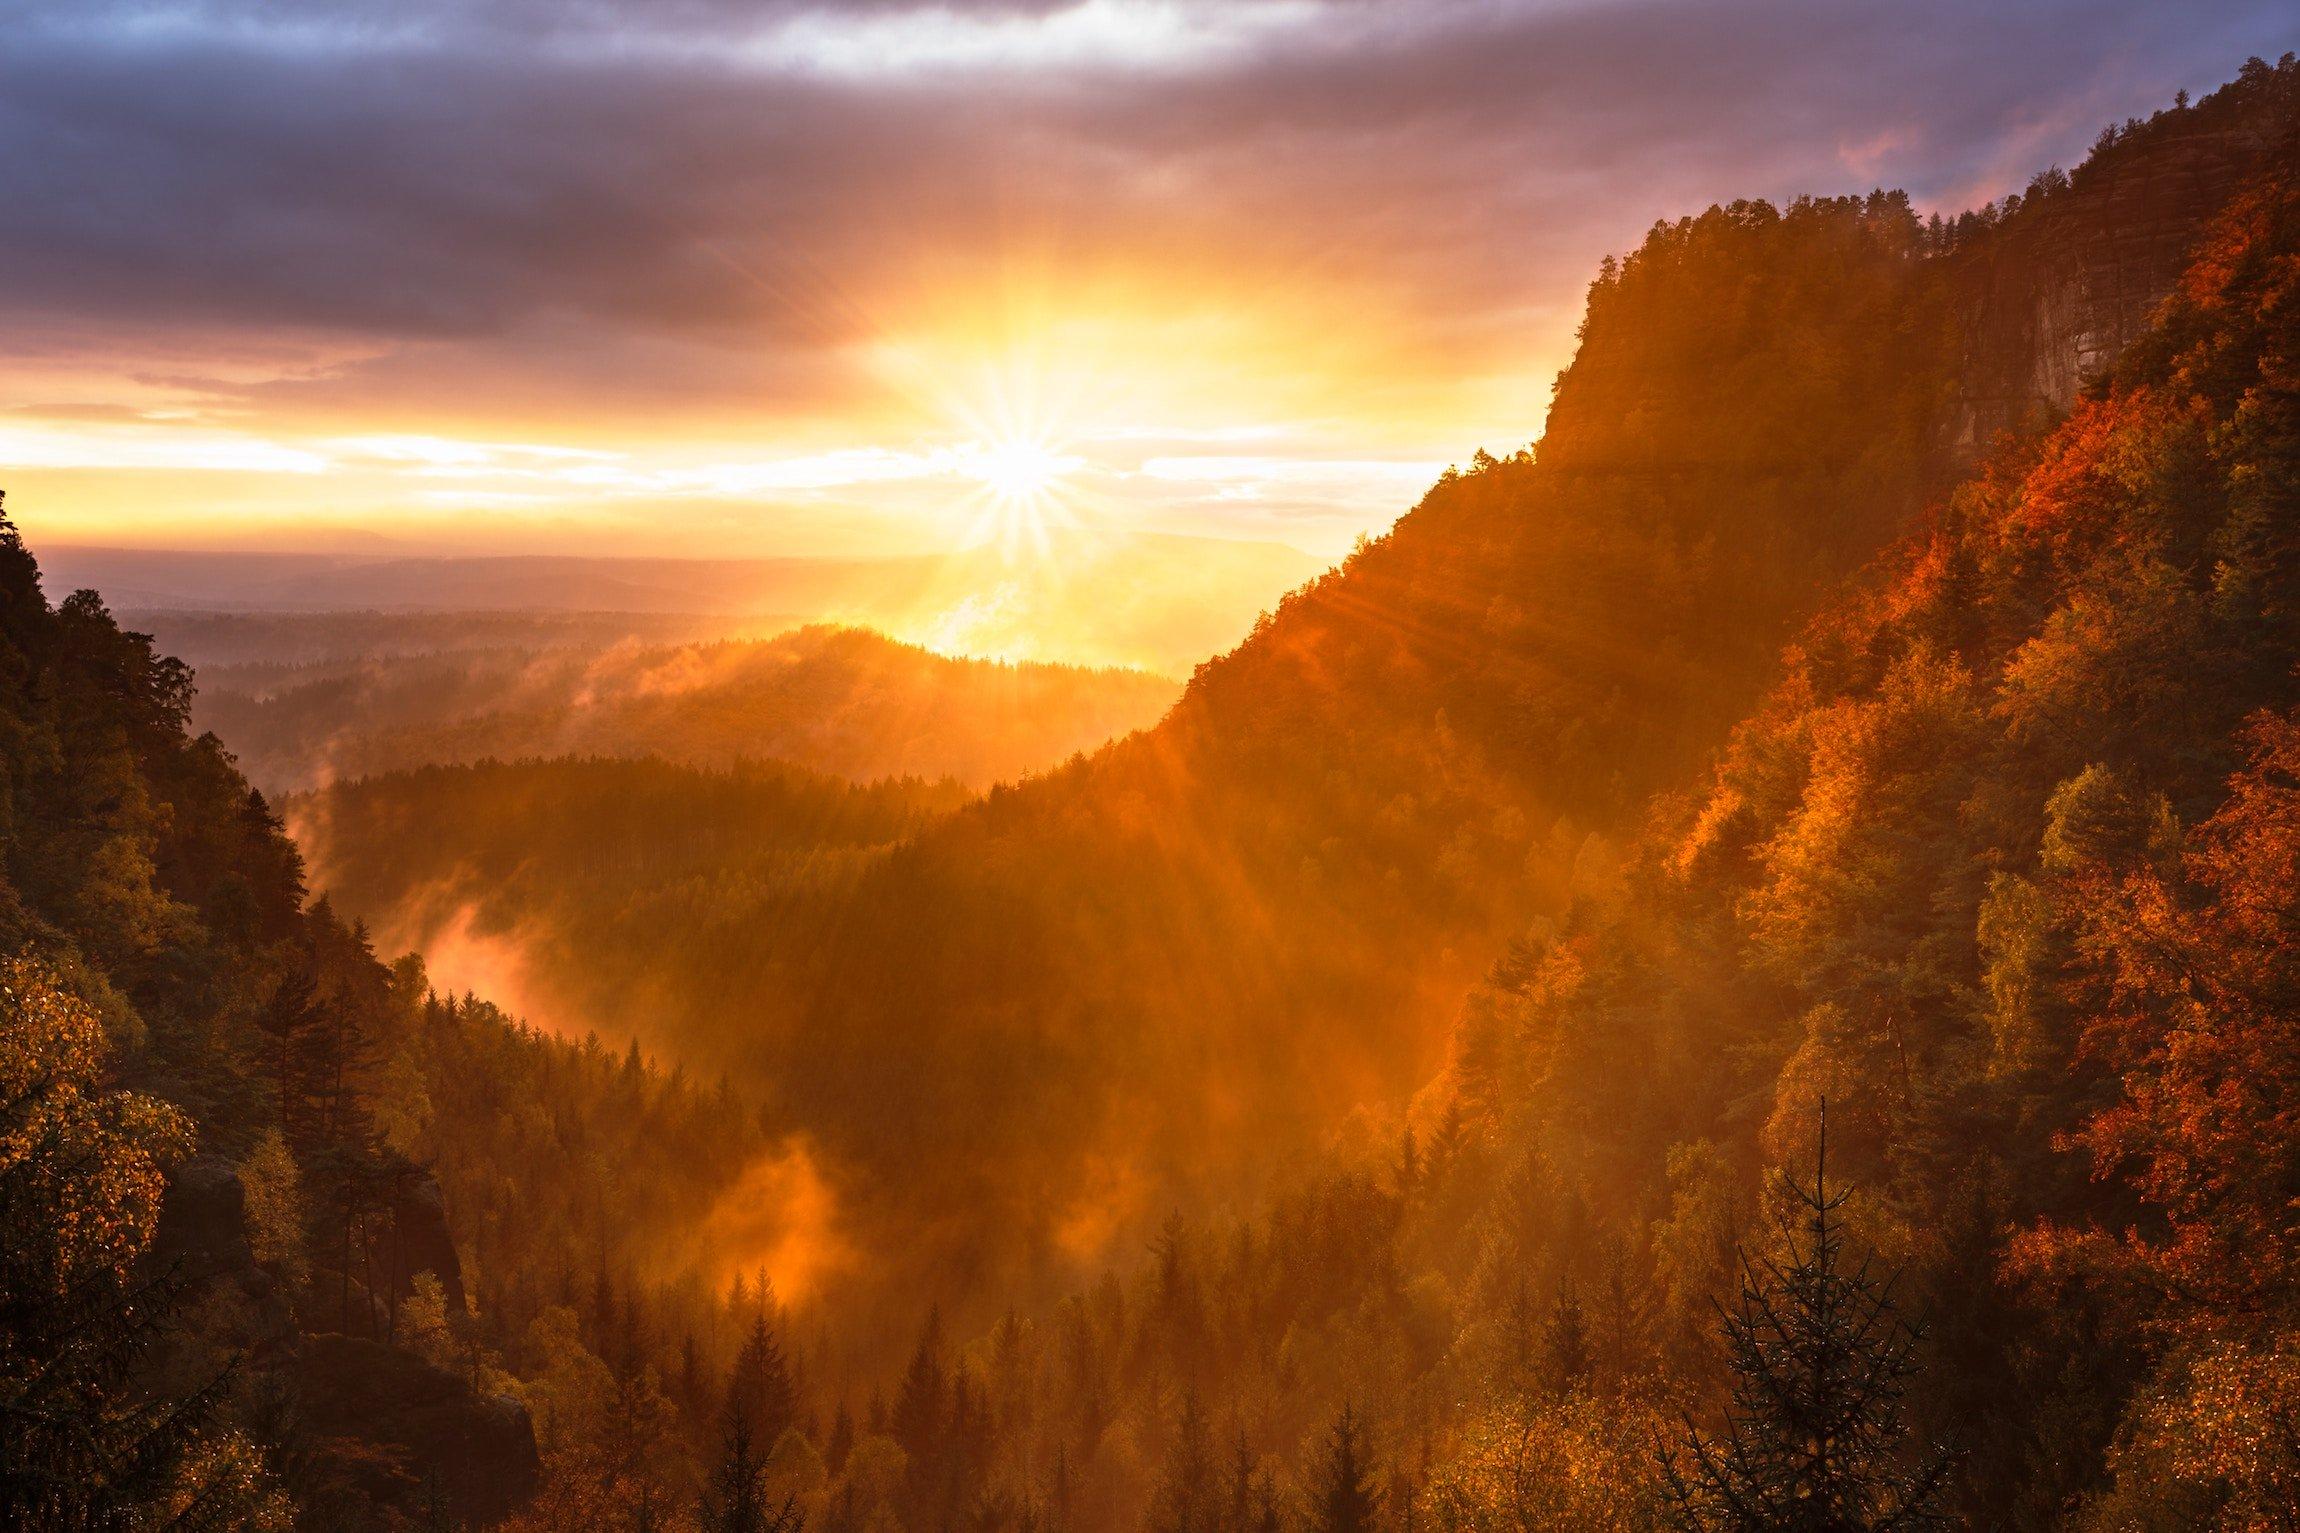 A sunrise over a canyon